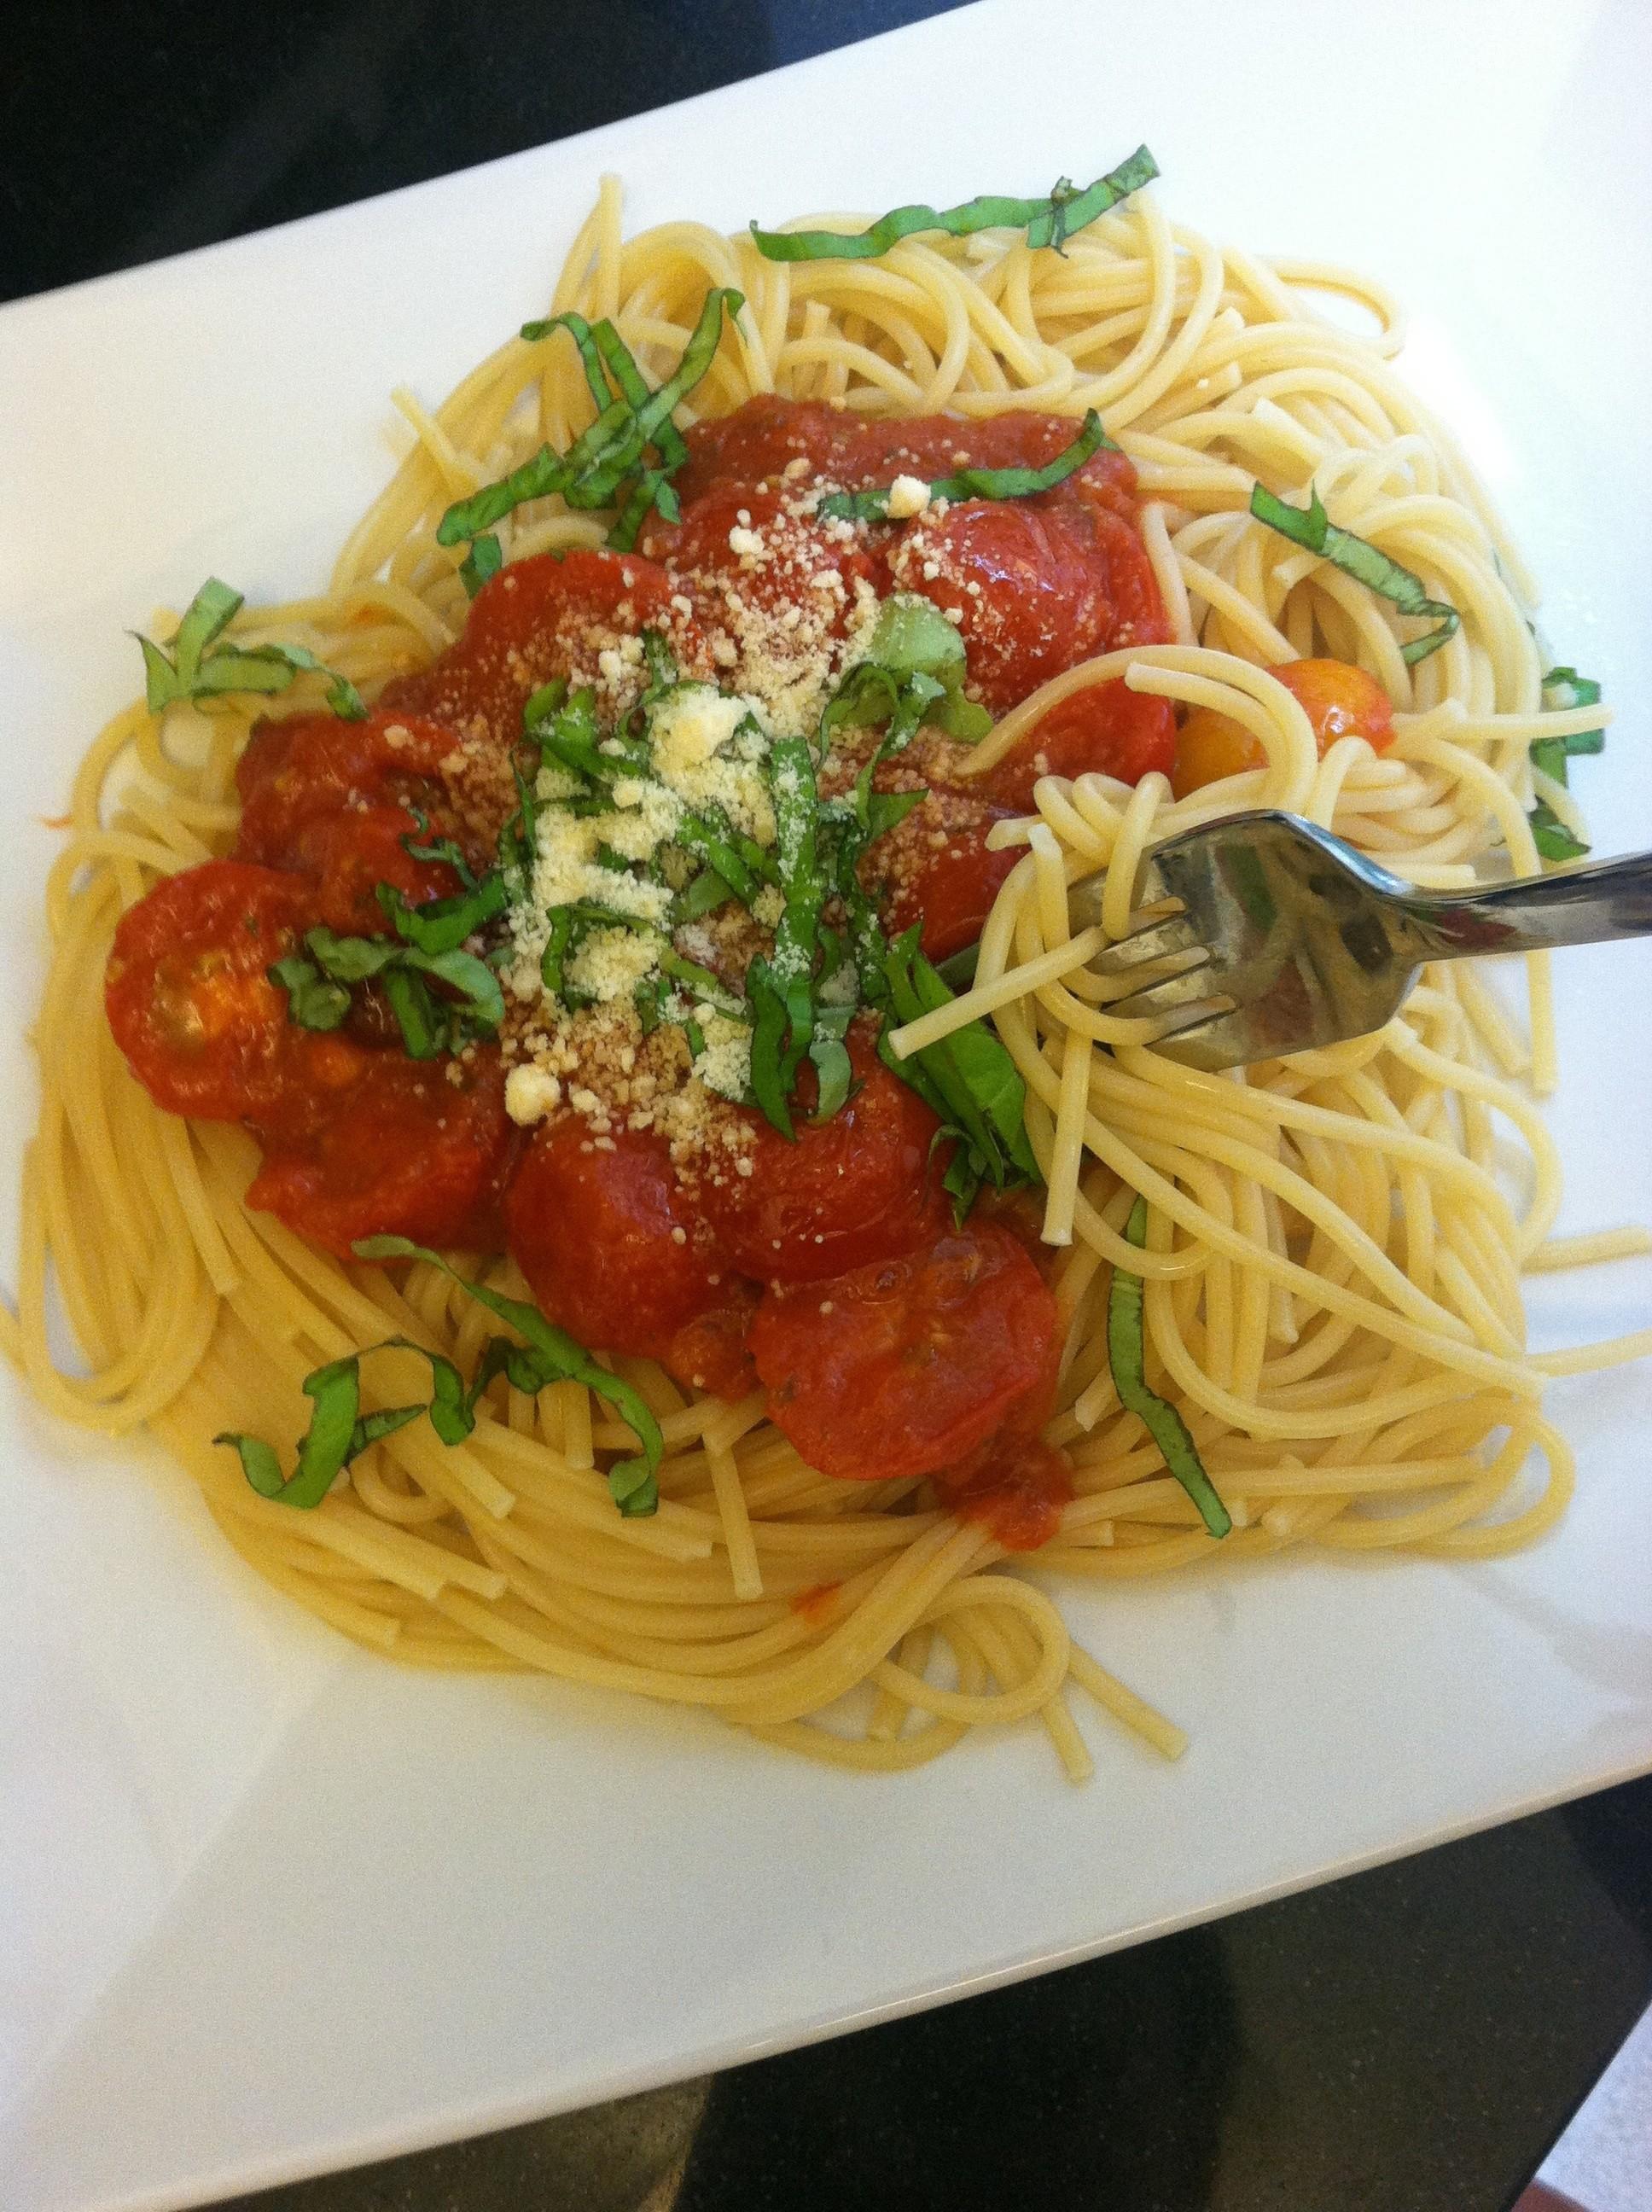 Italian pasta dinner with spiced up sauce gild garnish for Italian dinner